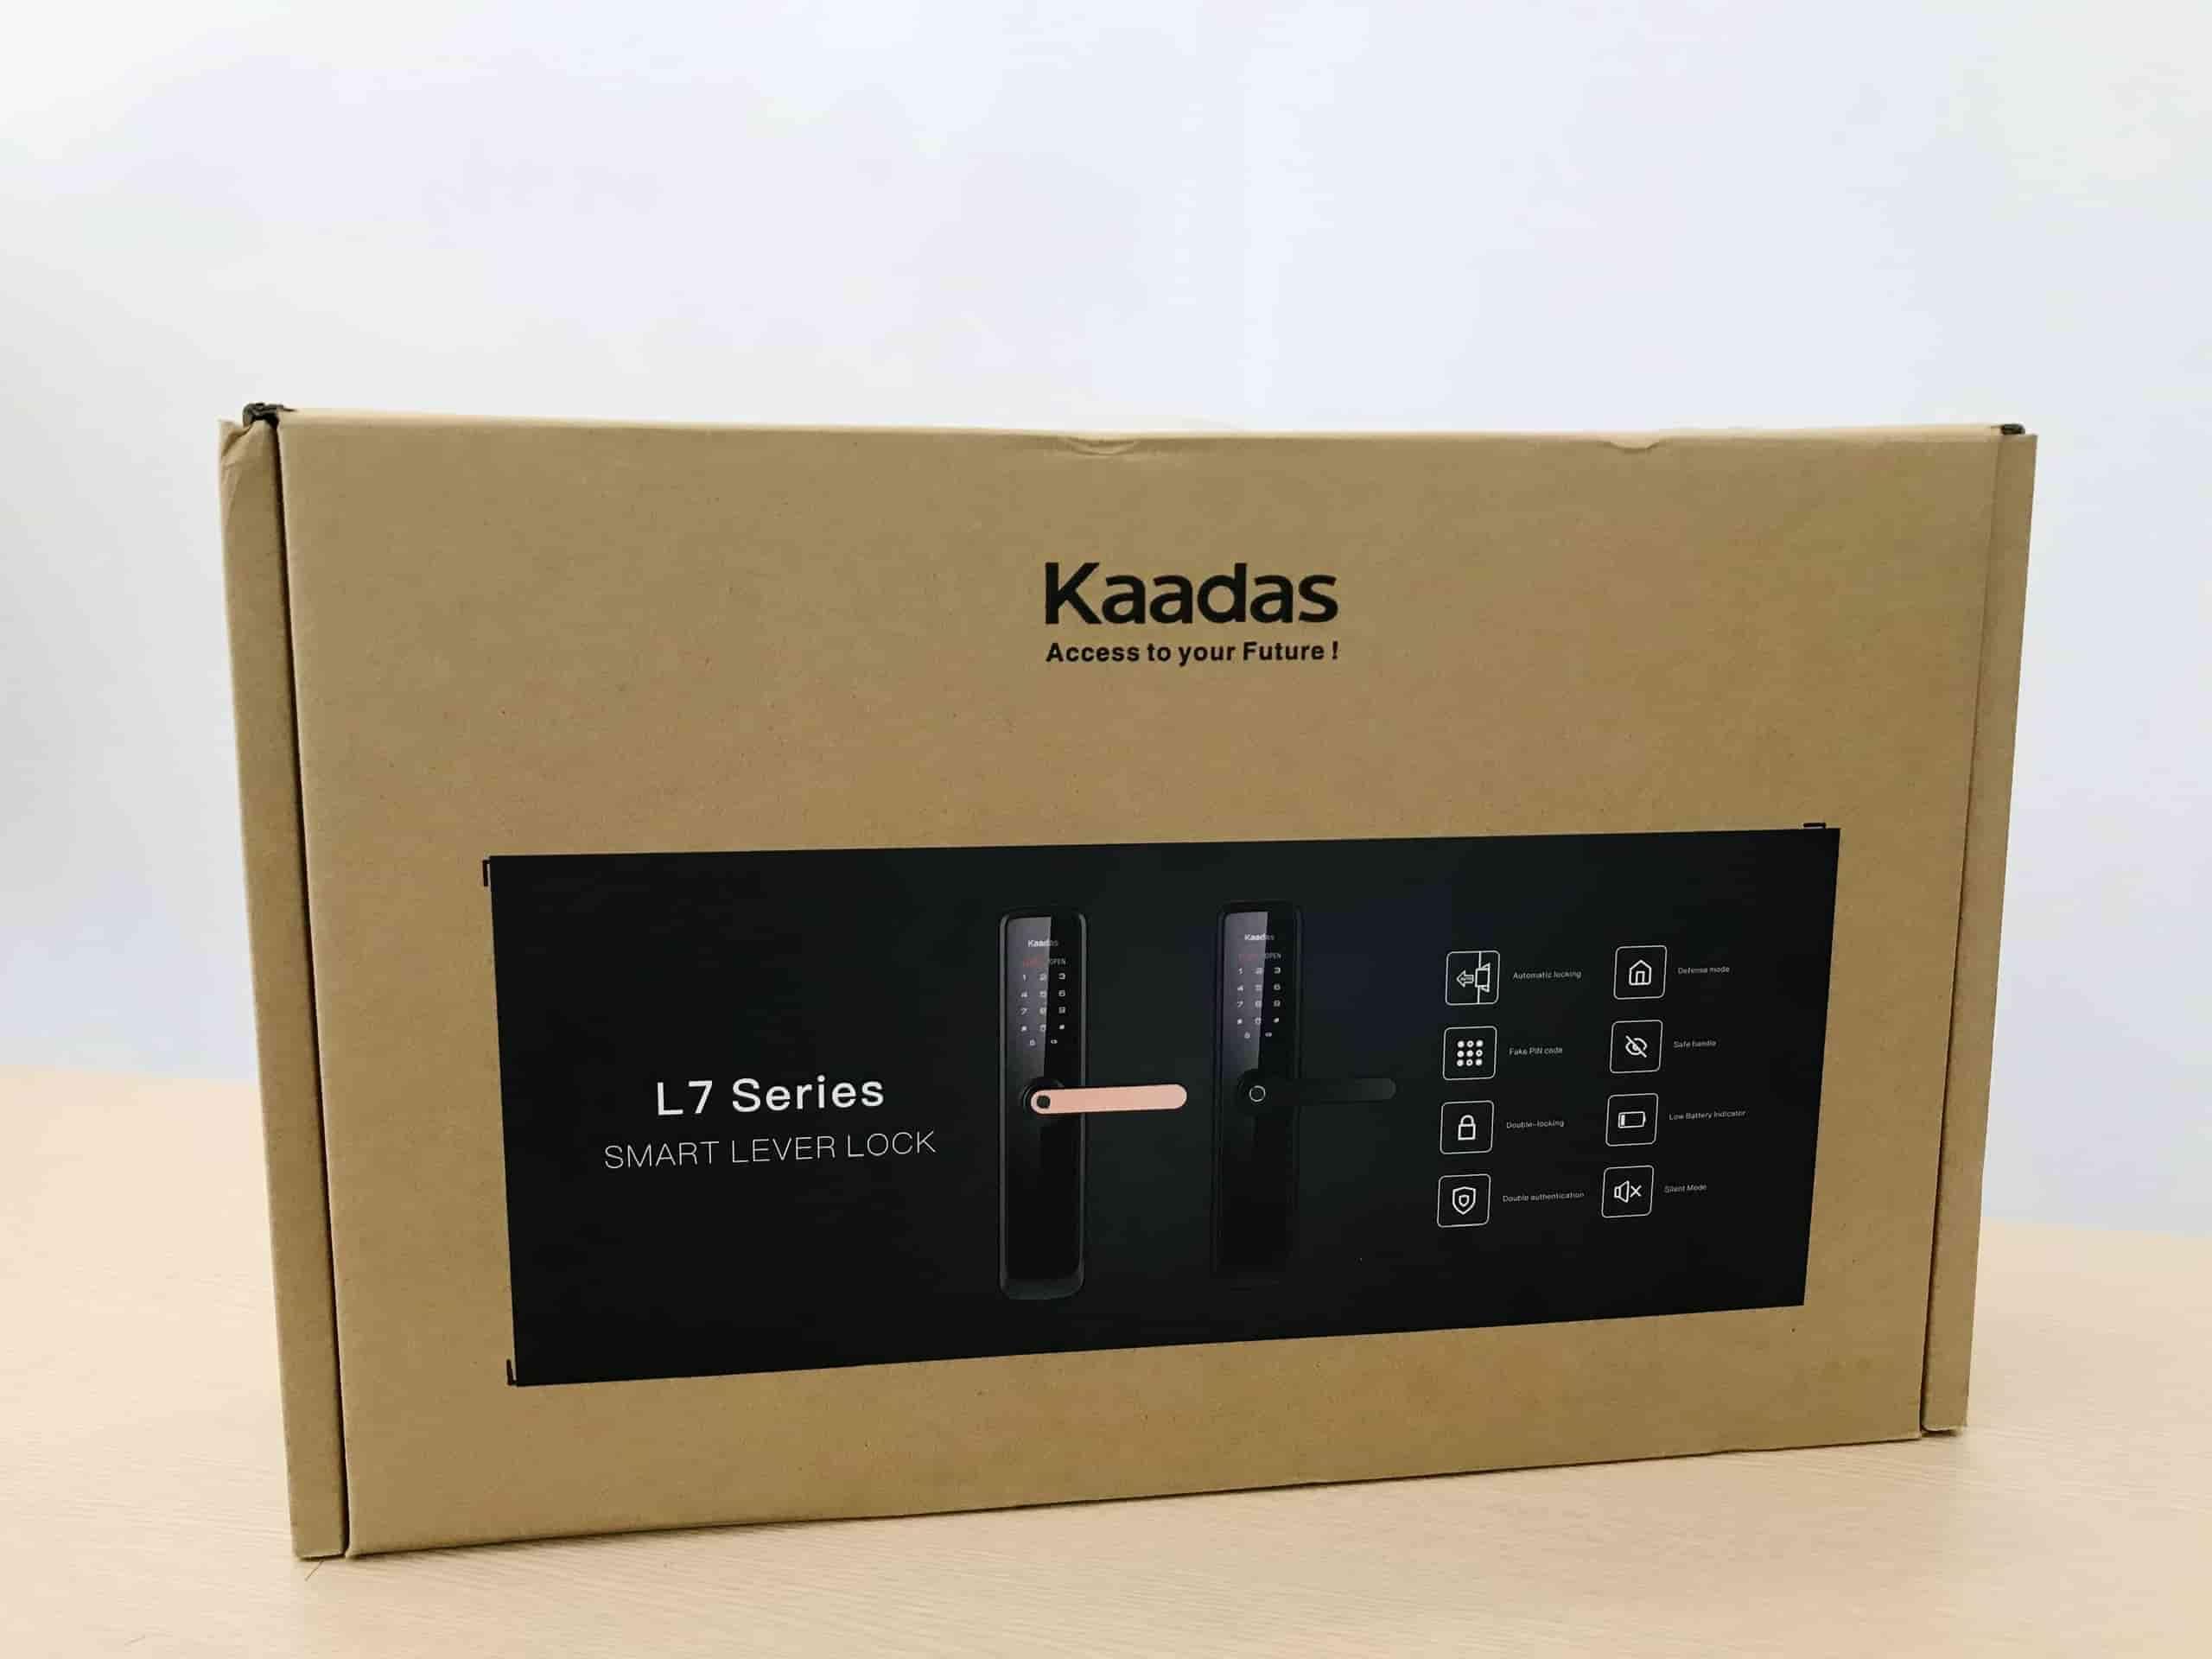 khoa van tay Kaadas L7